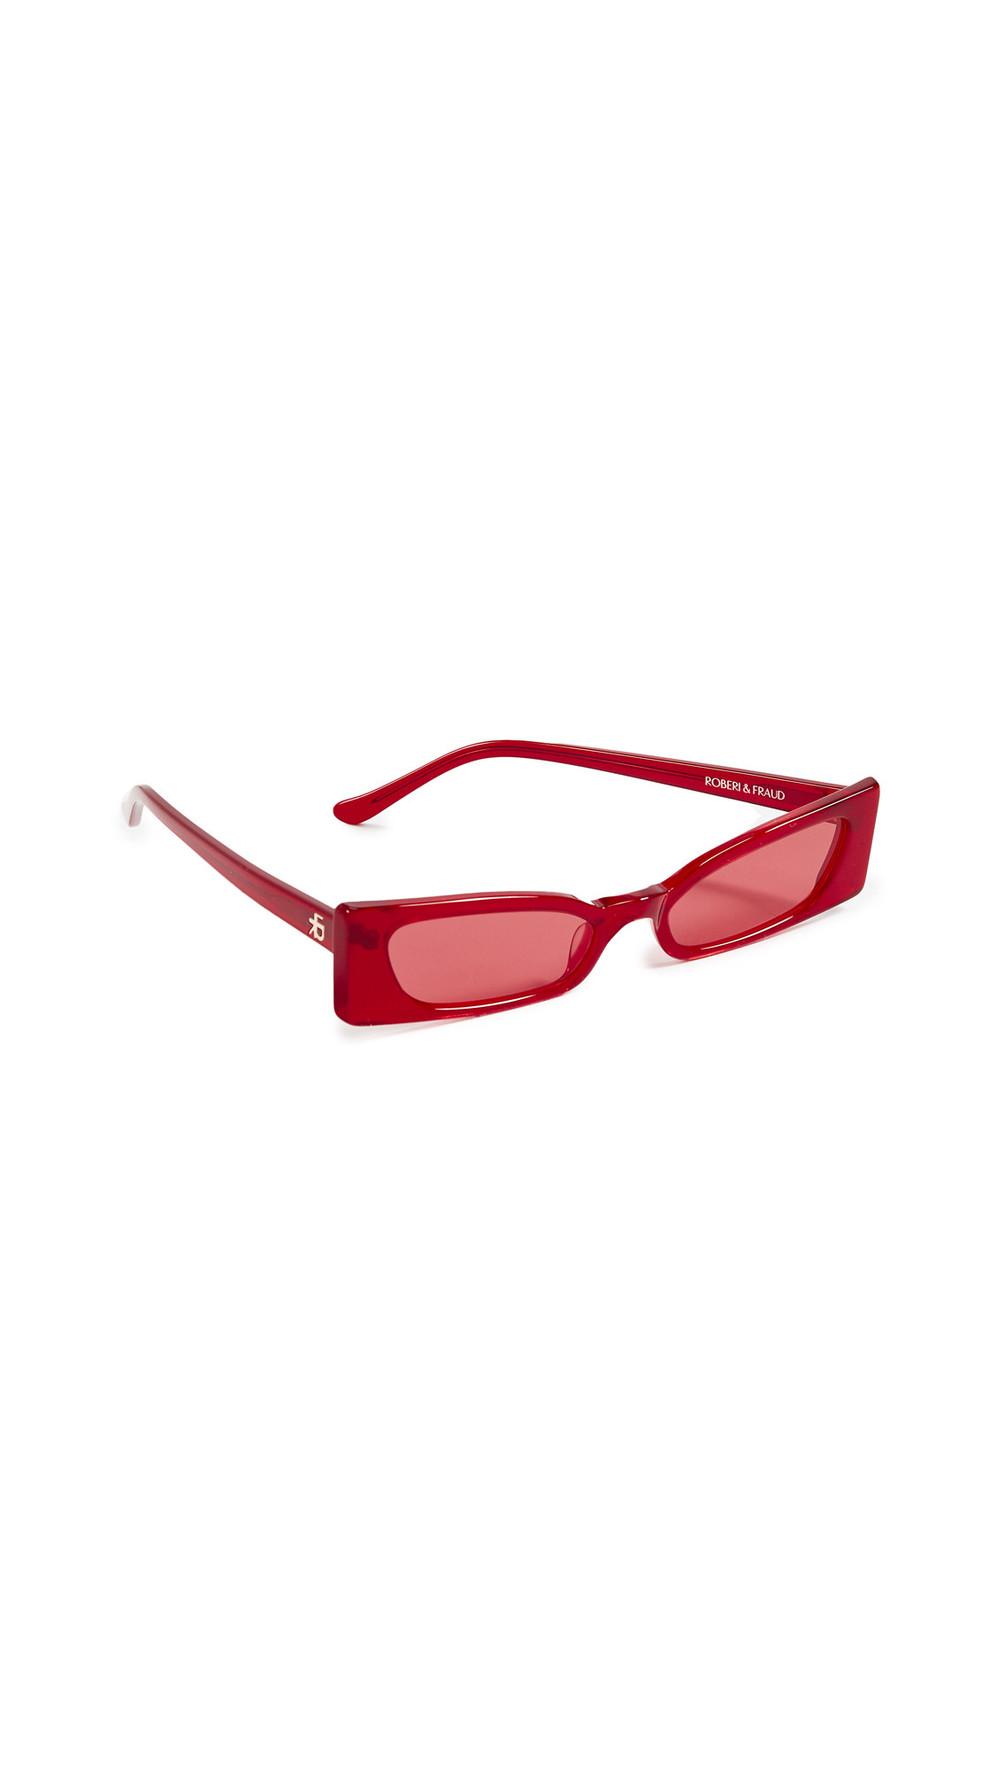 Roberi & Fraud Geraldine Sunglasses in red